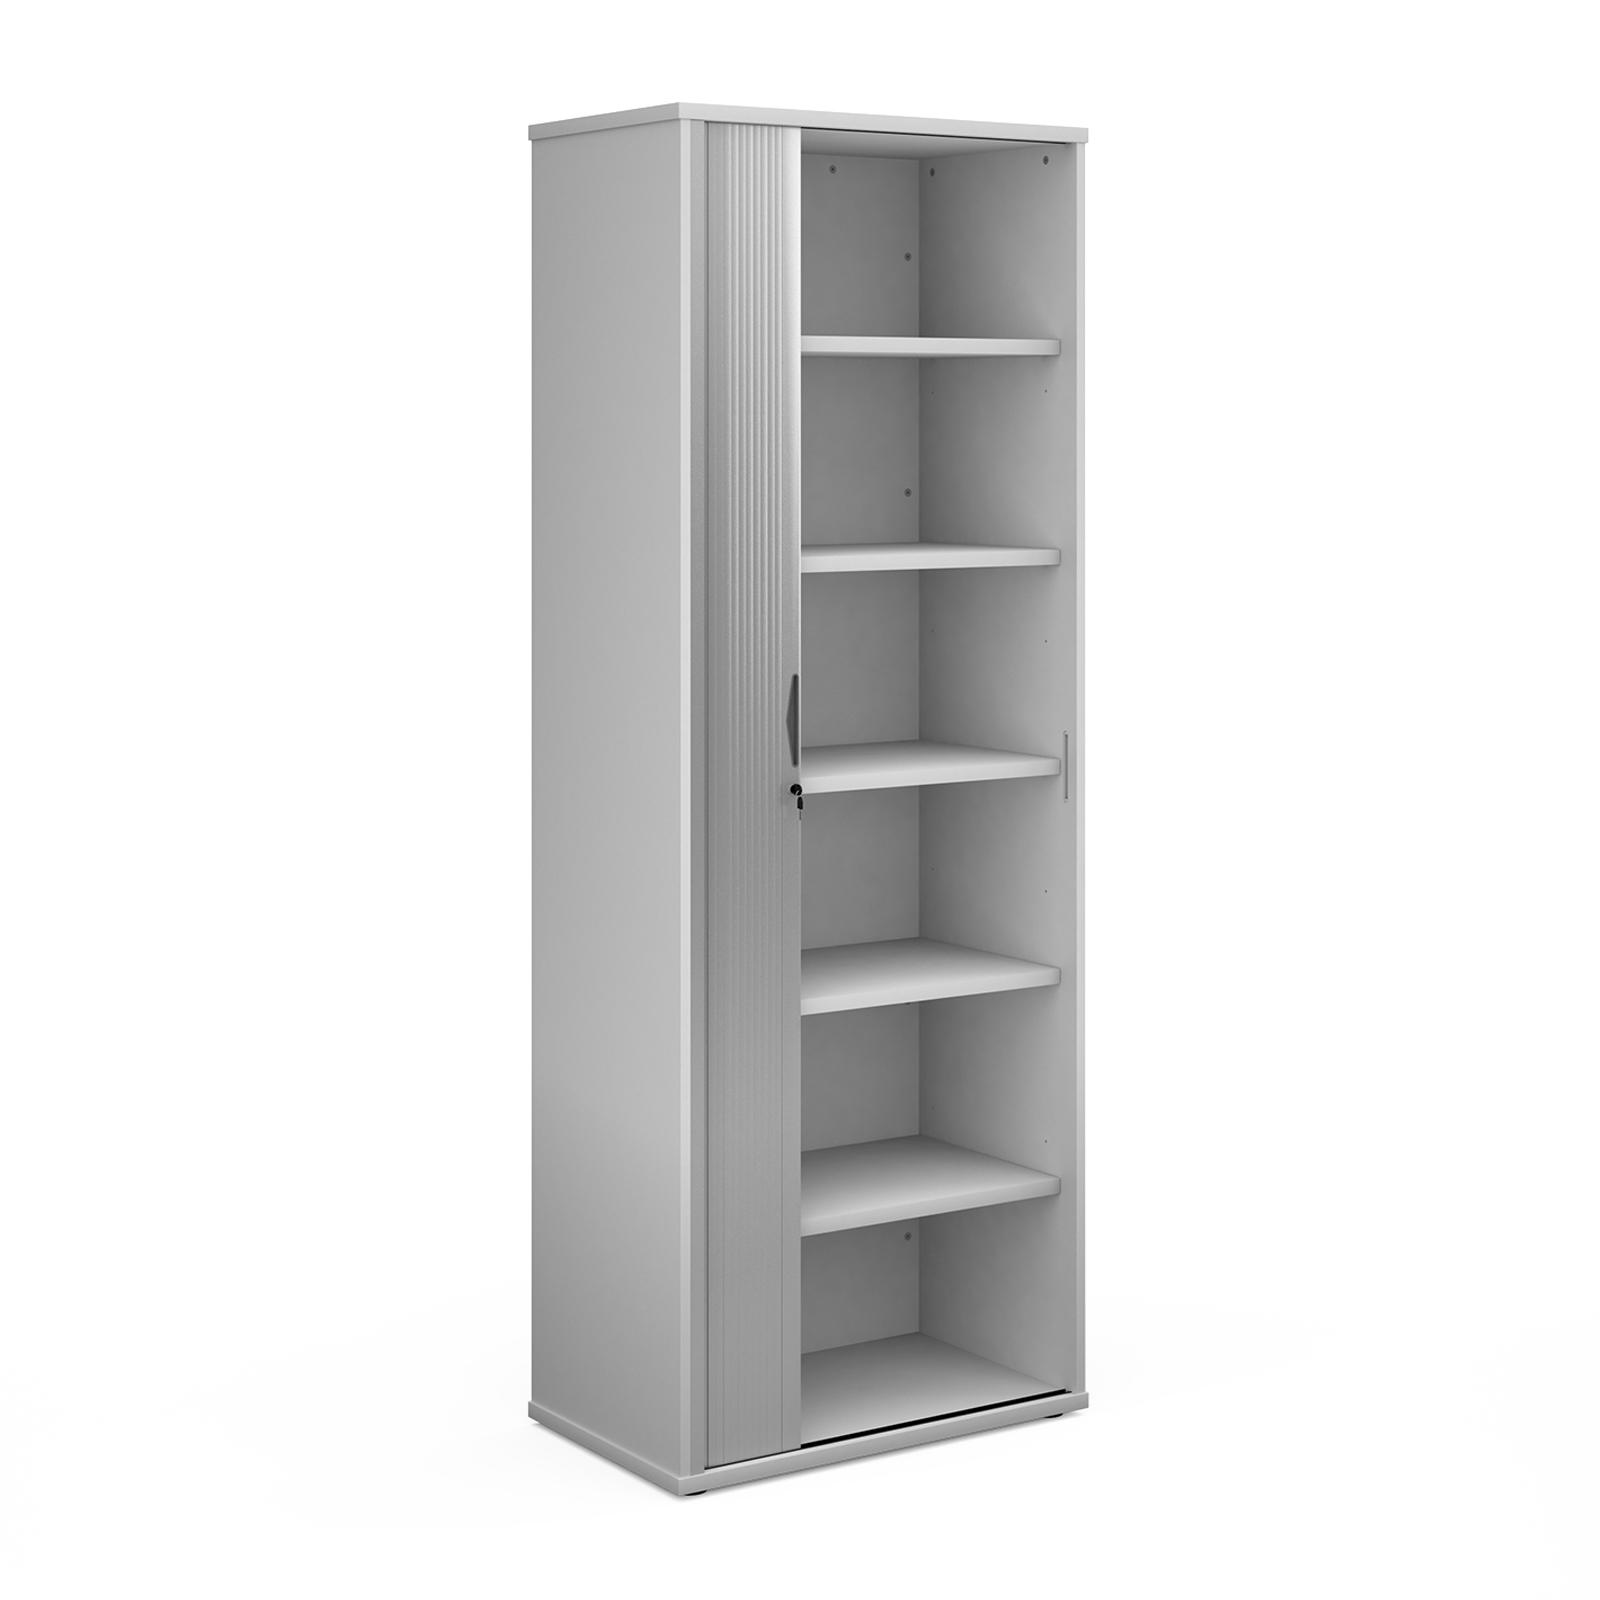 Universal single door tambour cupboard 2140mm high with 5 shelves - white with silver door